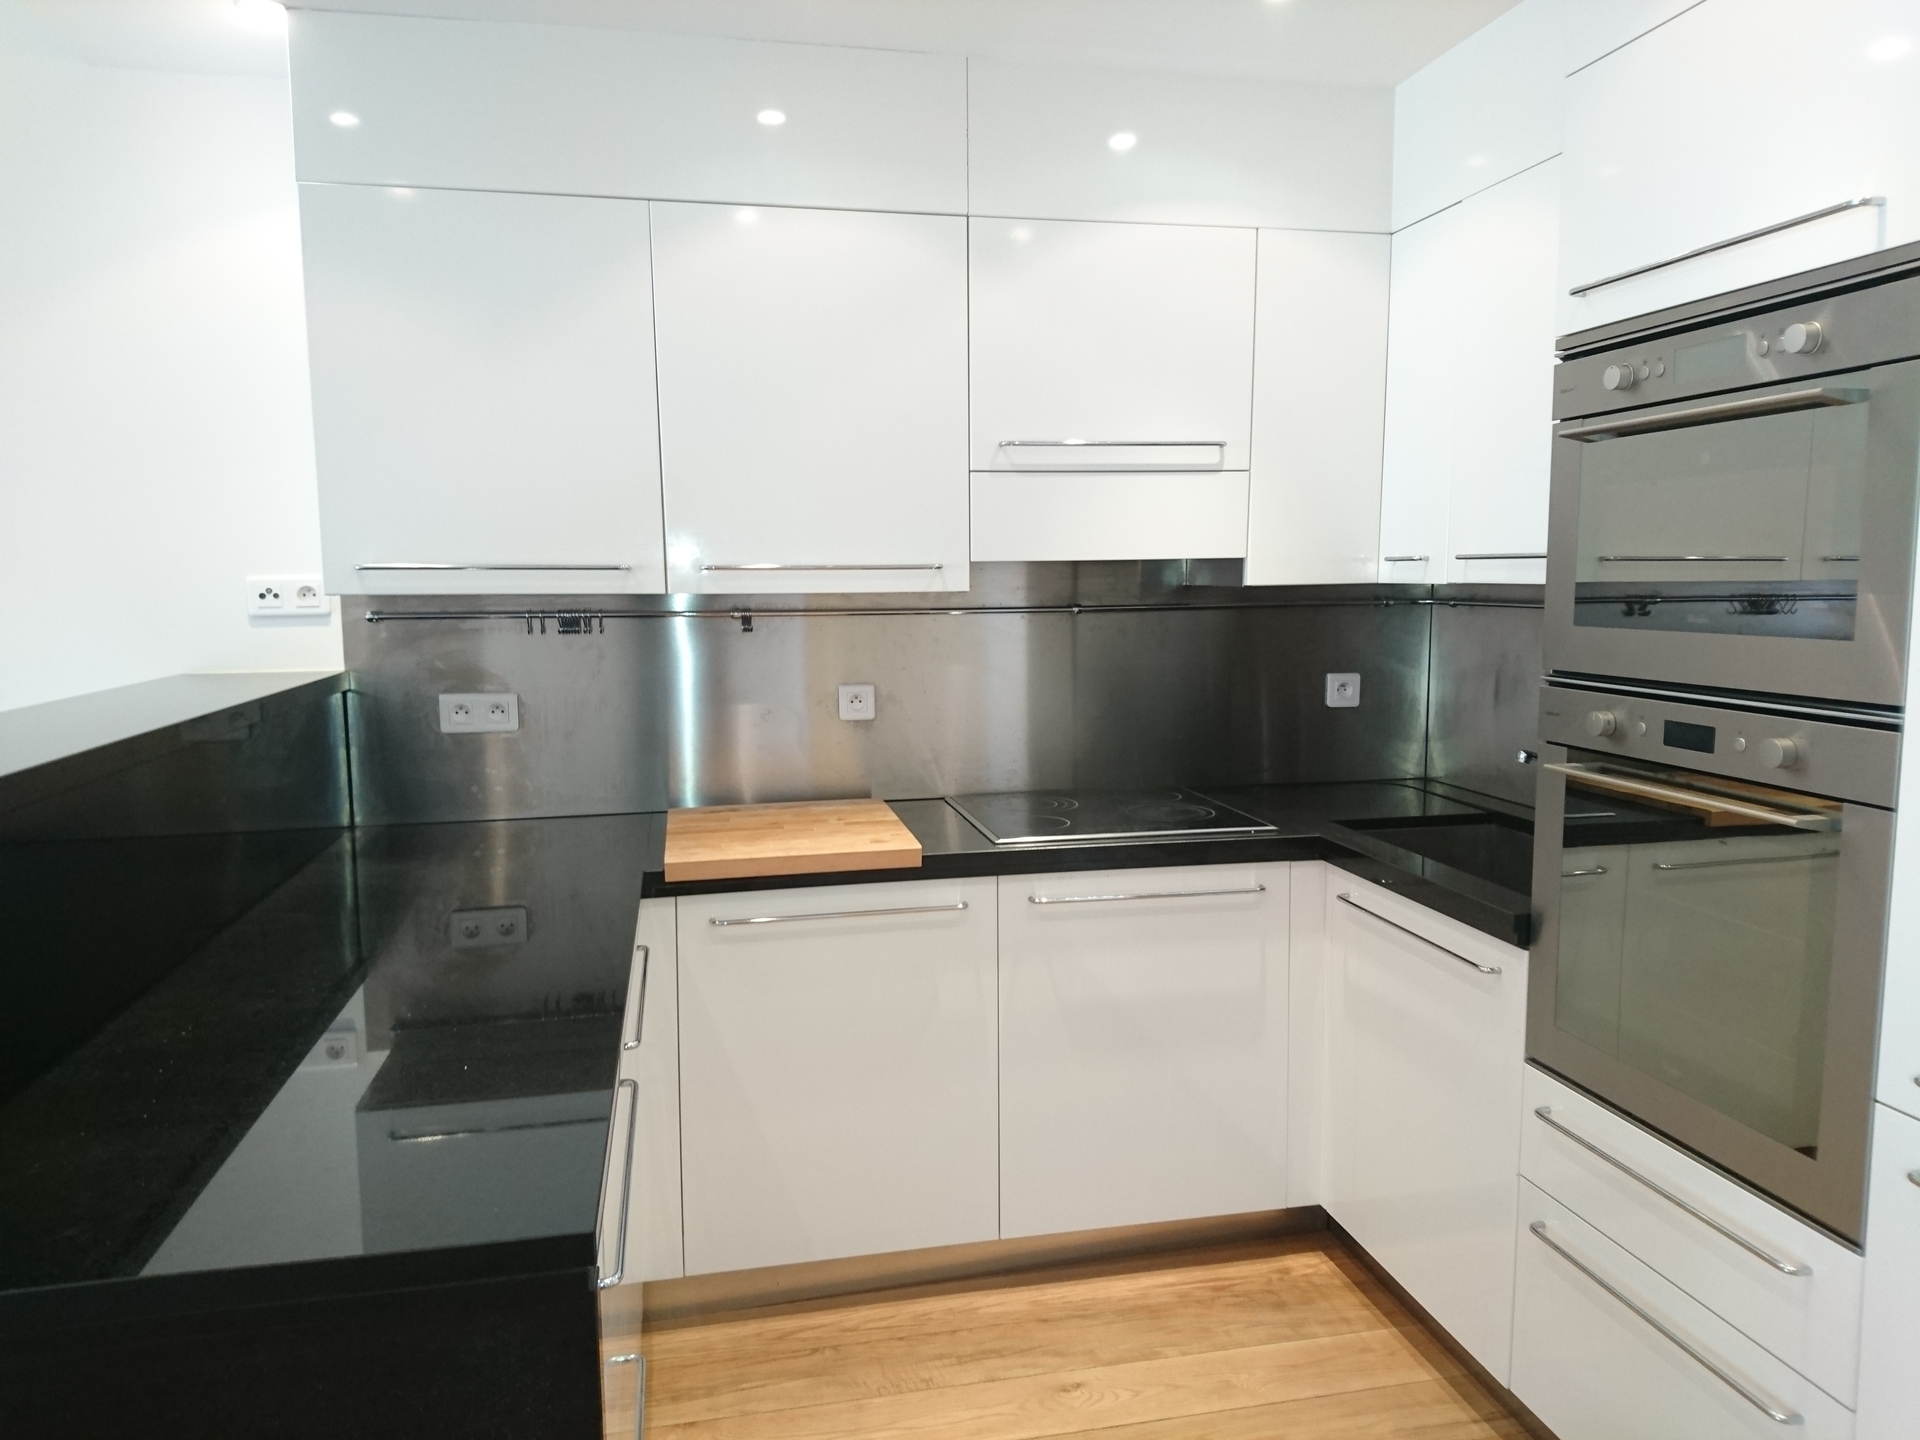 Affitti fontvieille studio nell 39 condominio le mantegna - Cacher cuisine ouverte ...